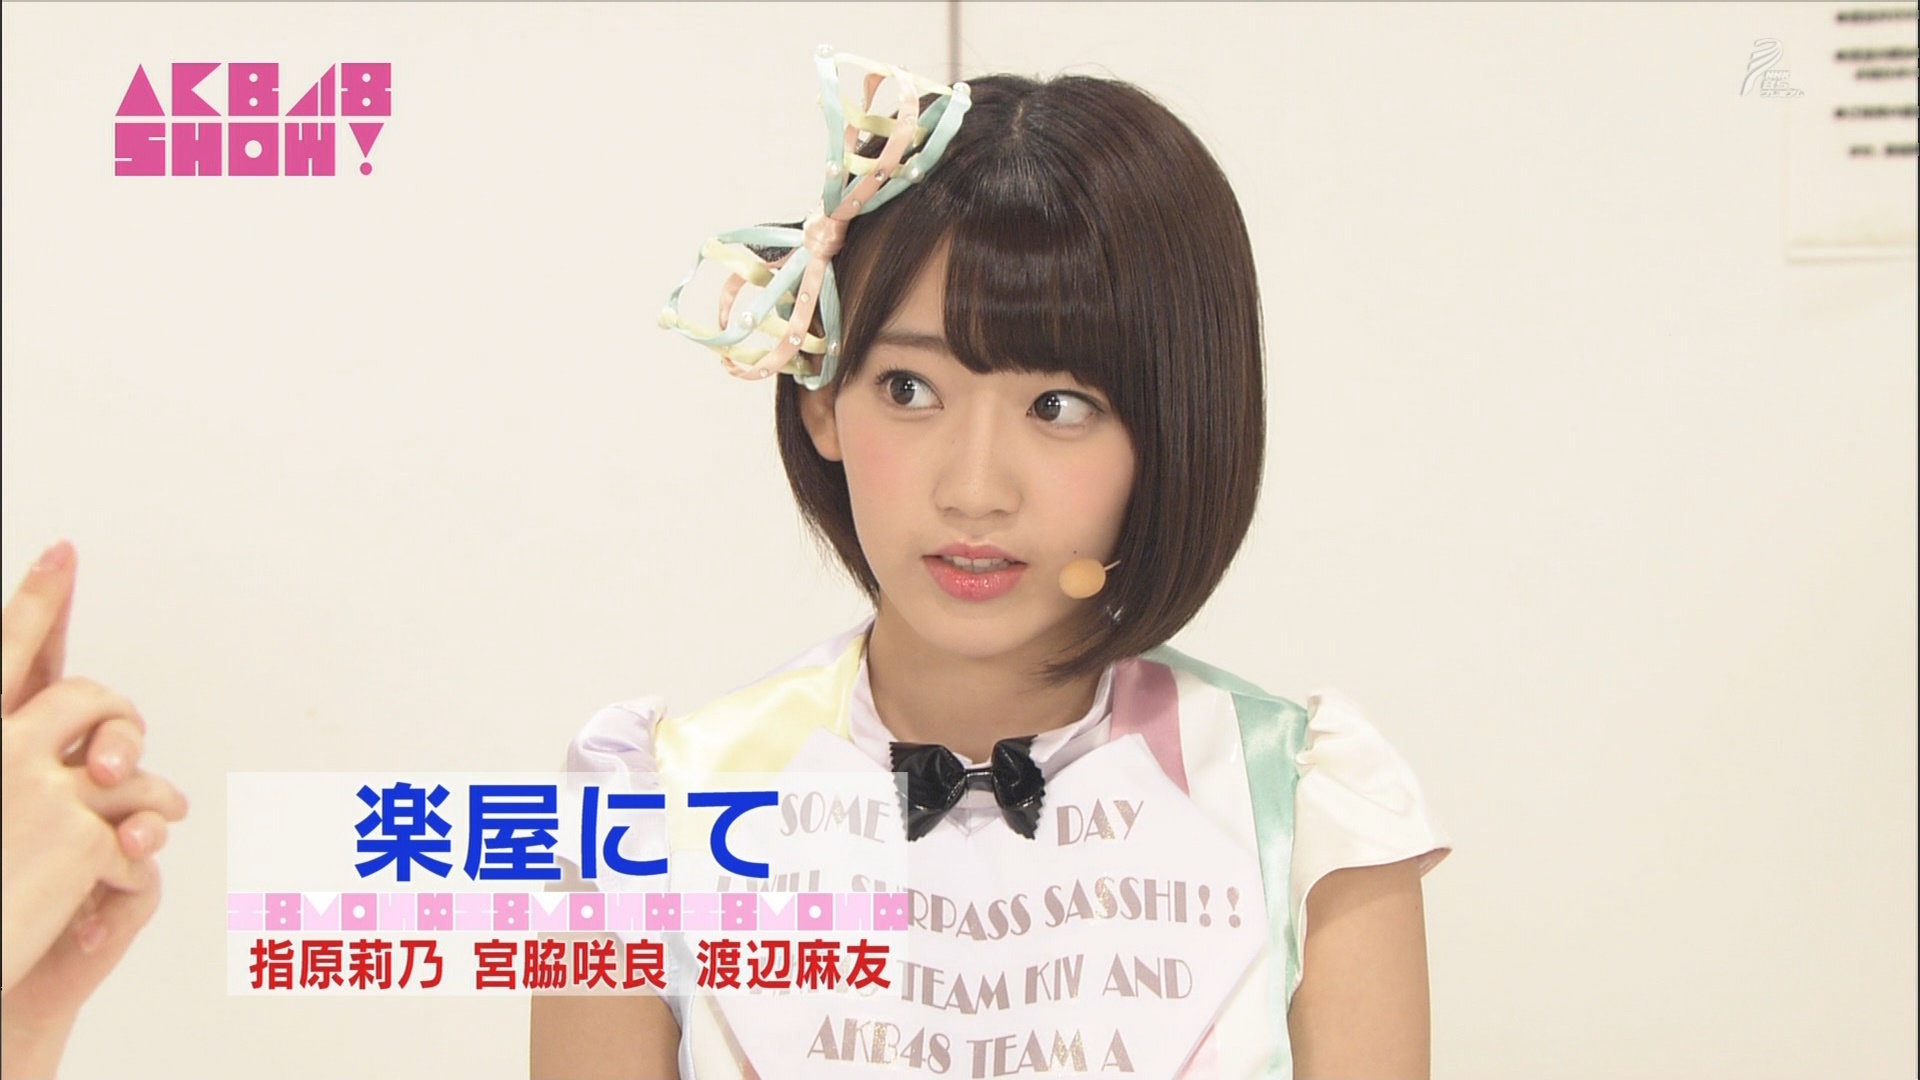 AKB48SHOW 心のプラカード 宮脇咲良 20140830